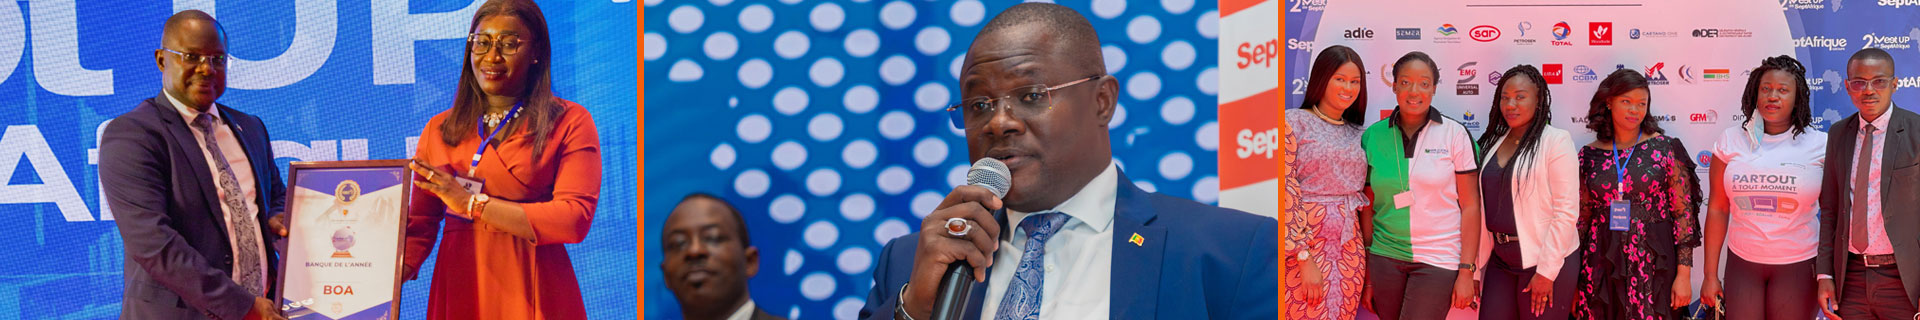 BOA-SENEGAL à la seconde édition du MeetUp de Media Sept Afrique